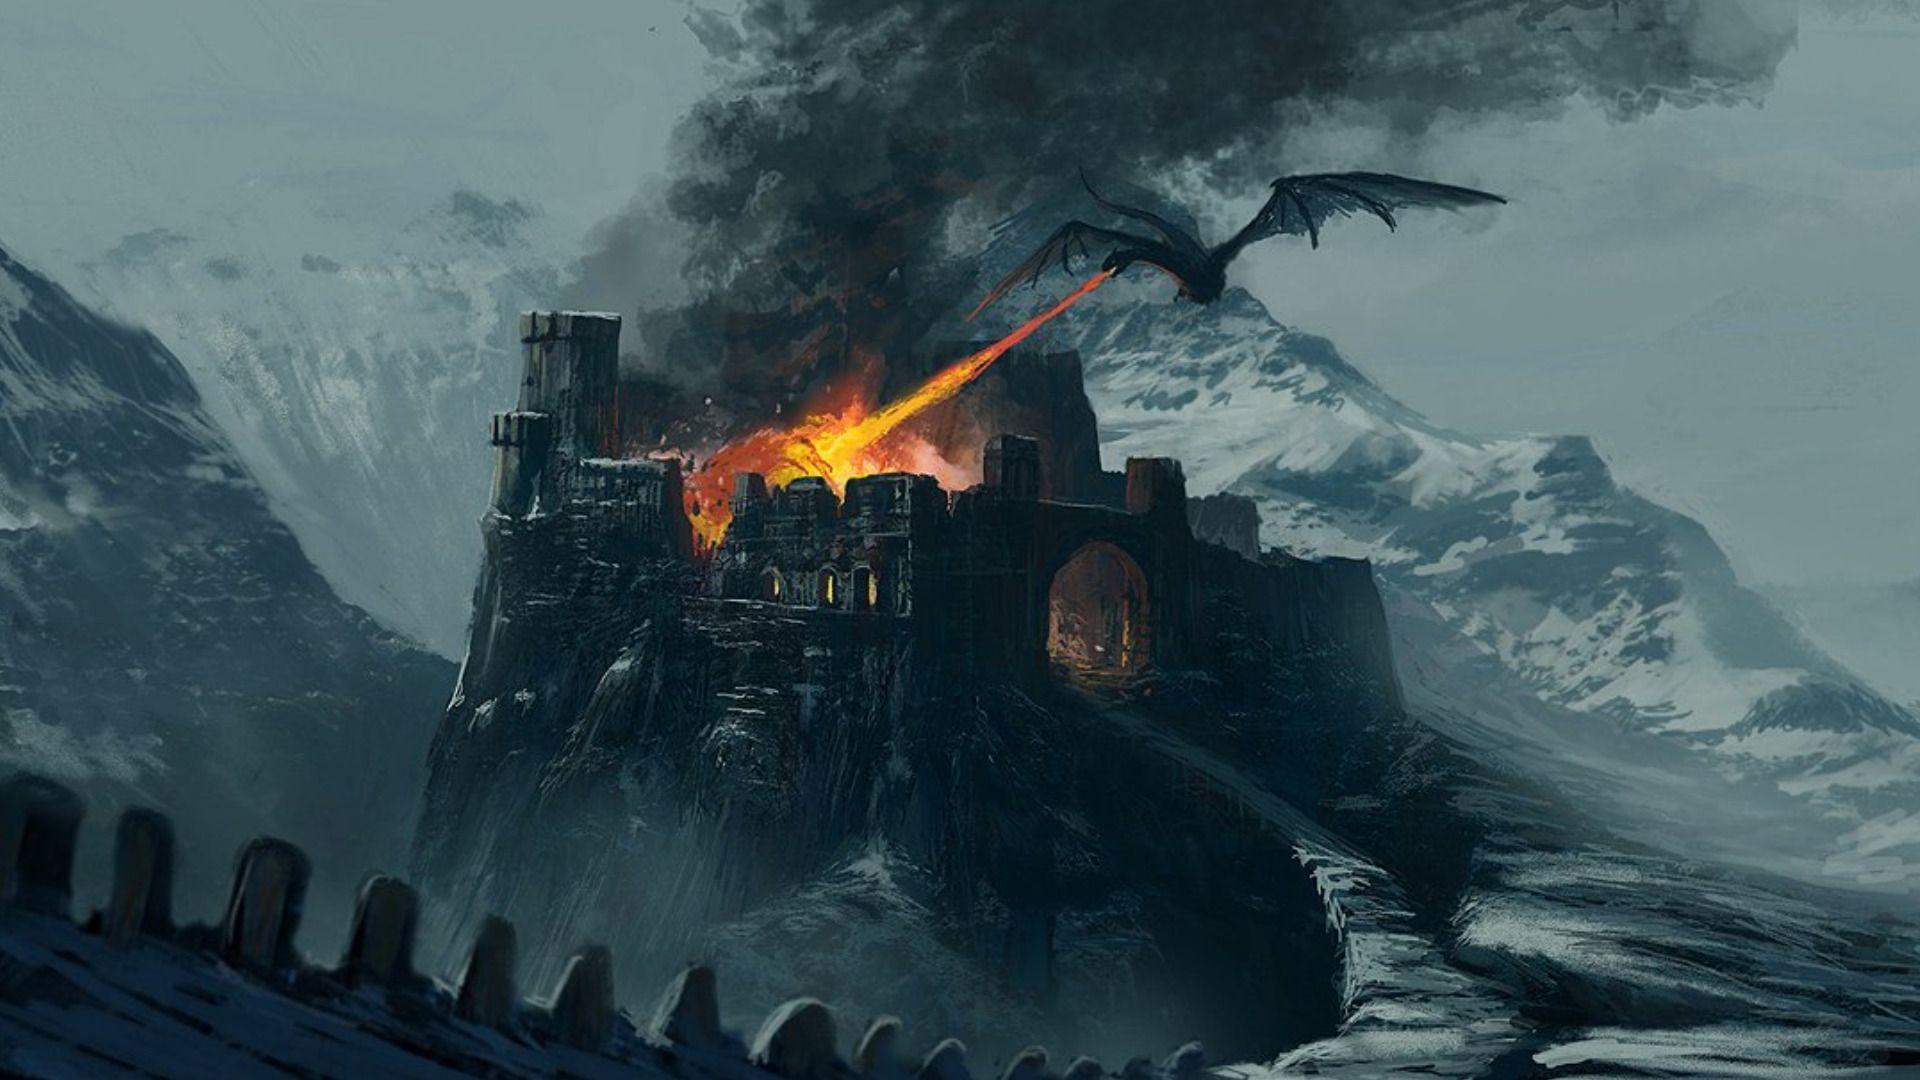 картинка дракон над замком основе